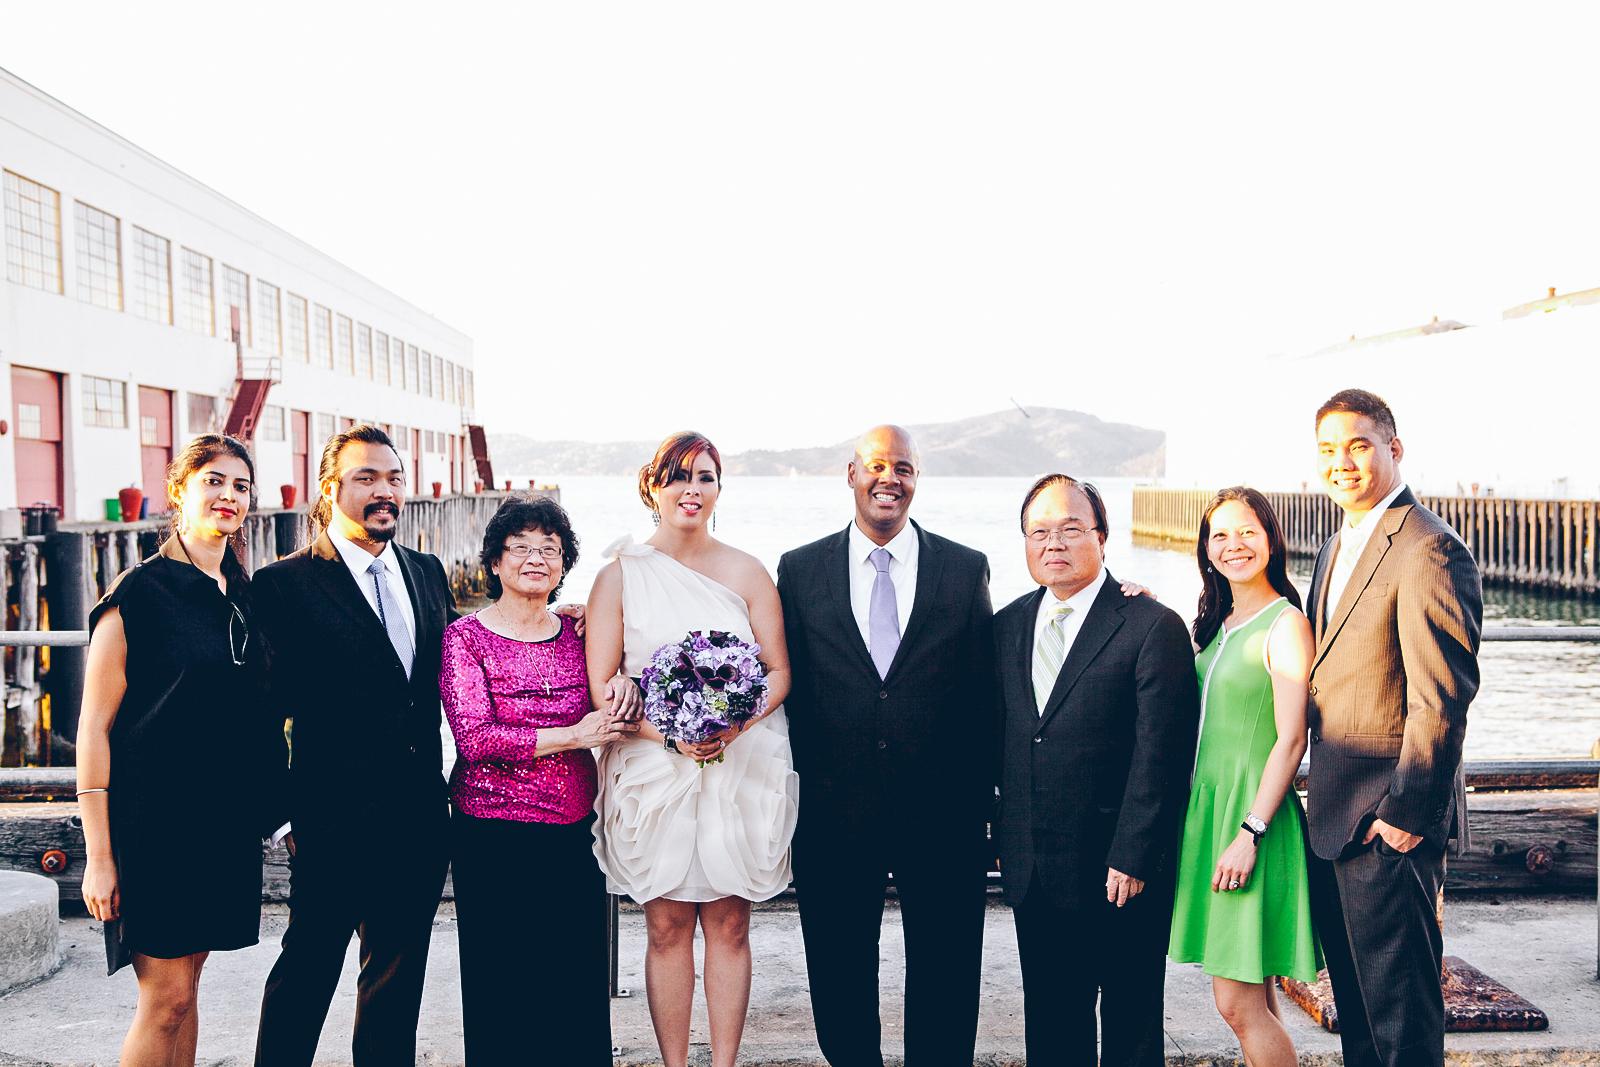 greens_restaurant_wedding_photography_san_franscisco_ebony_siovhan_bokeh_photography_57.jpg